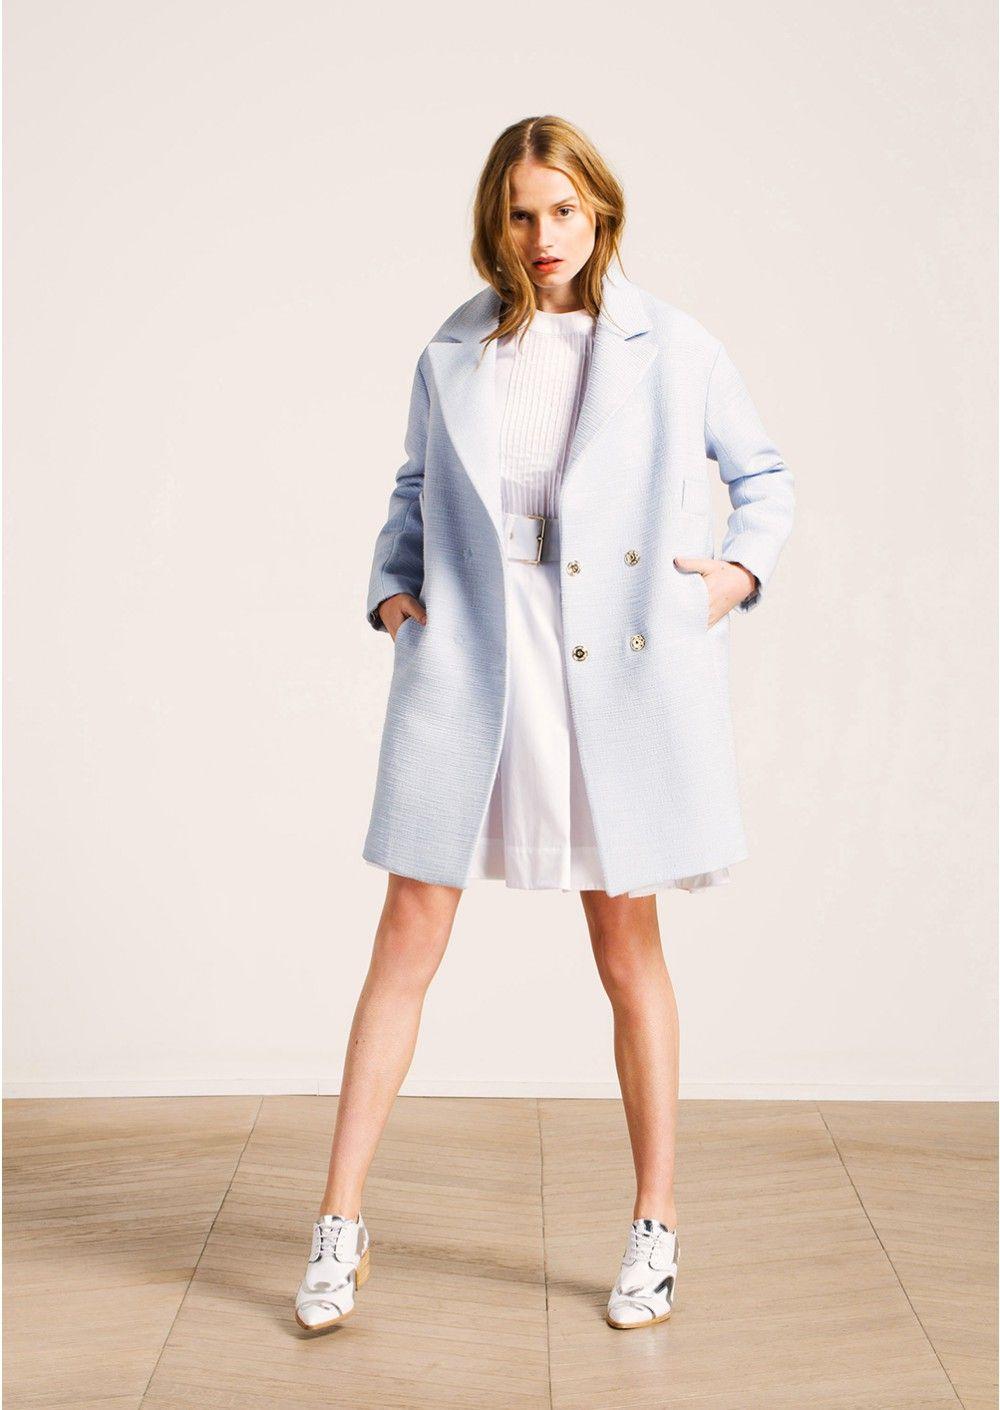 manteau oversize en lin rustique bleu ciel femme tara jarmon 3 wedding guest pinterest. Black Bedroom Furniture Sets. Home Design Ideas